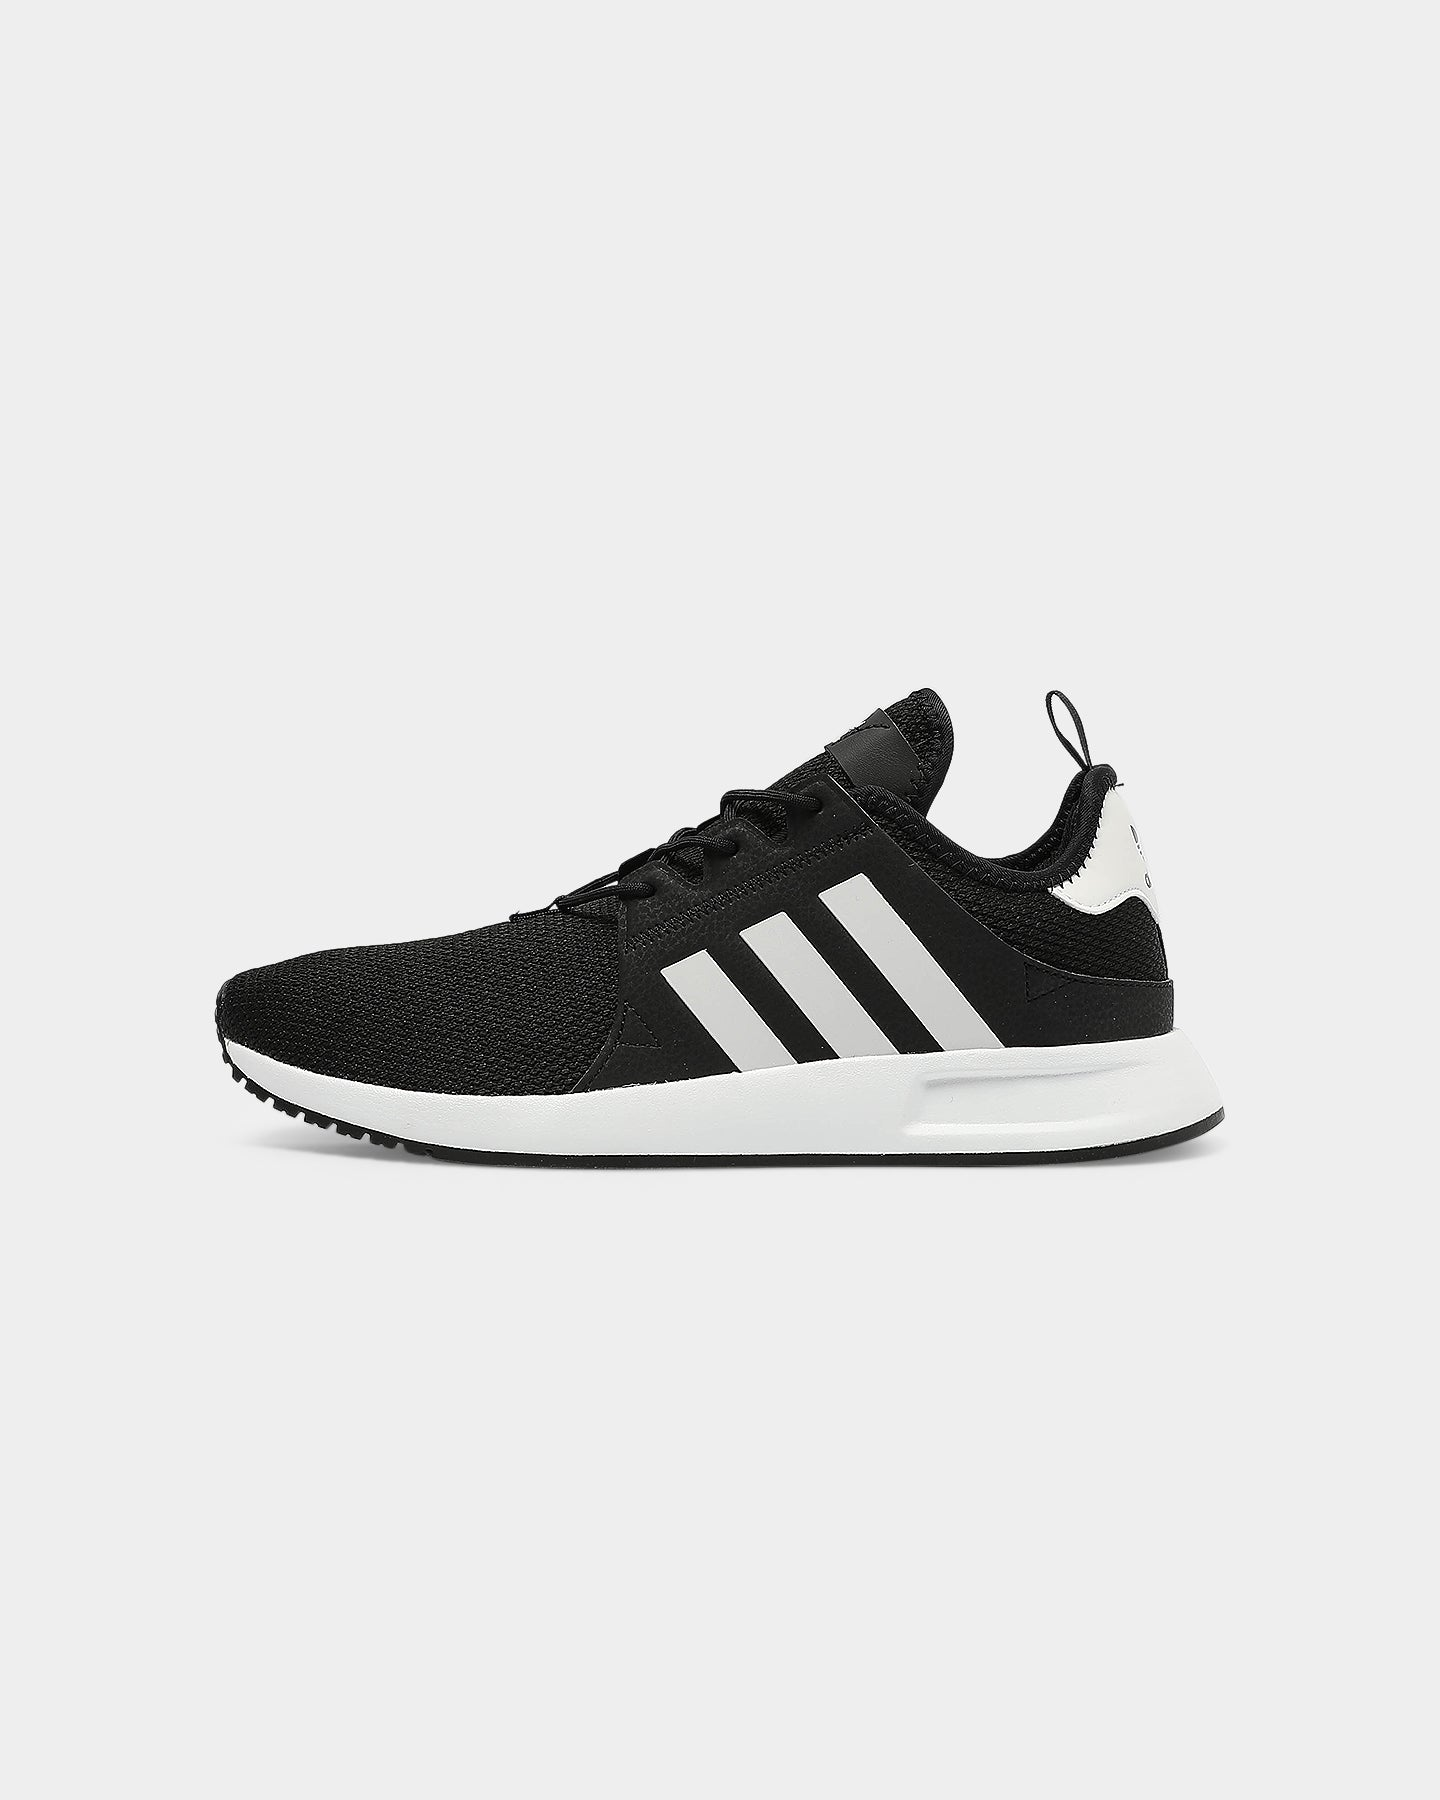 Adidas yeezy legit check instagram free | Originals X PLR BlackWhite